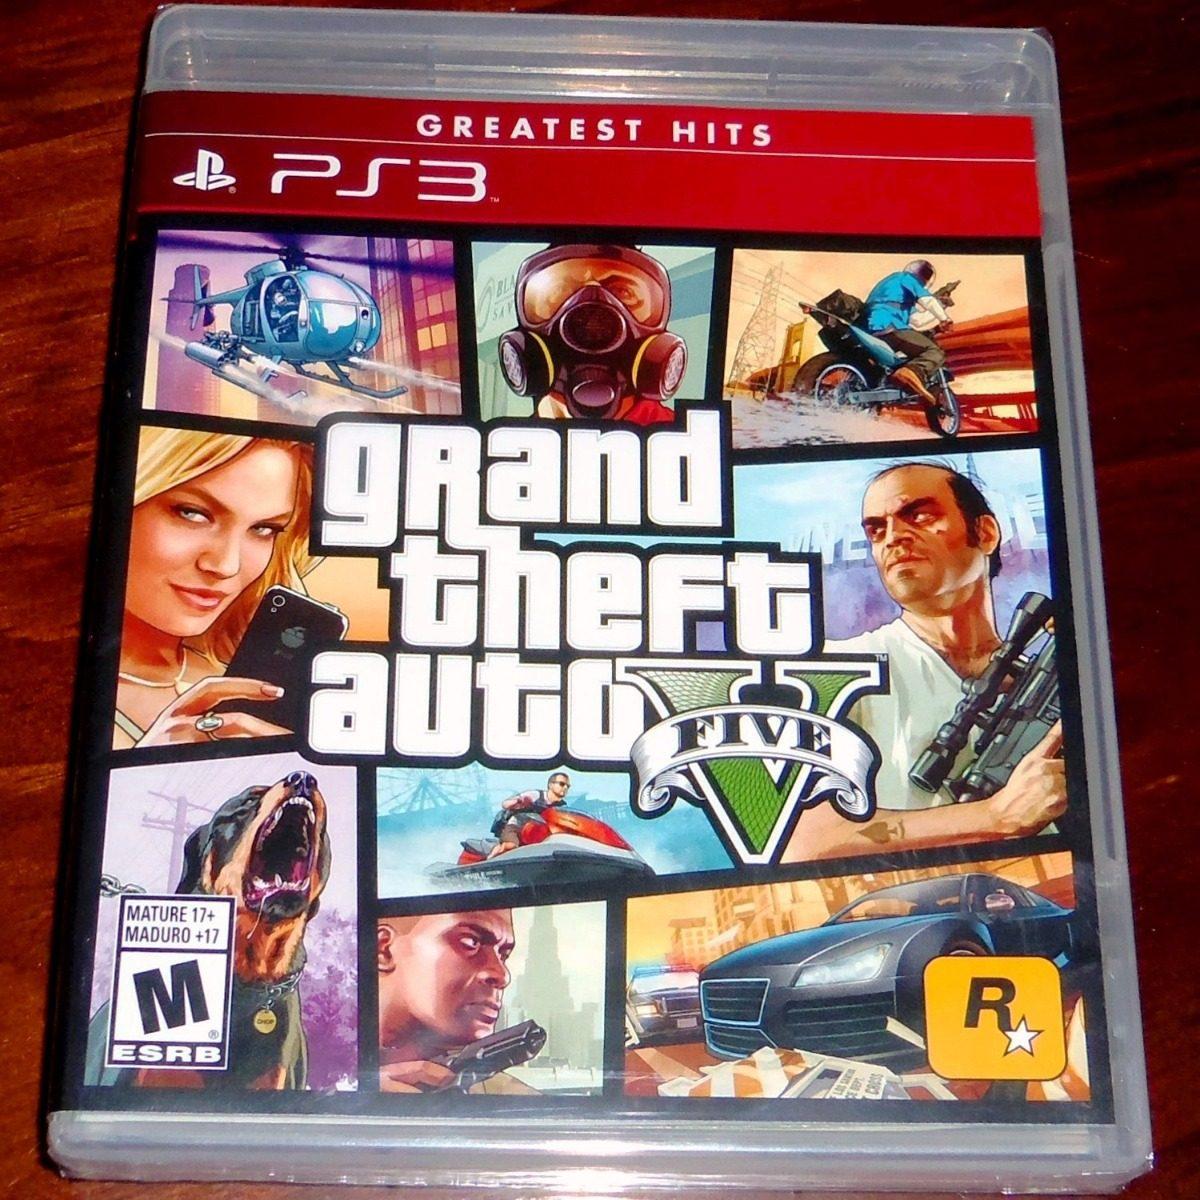 Gta Grand Theft Auto V 5 Ps3: Videojuego Grand Theft Auto V Gta 5 Ps3 Físico Nuevo